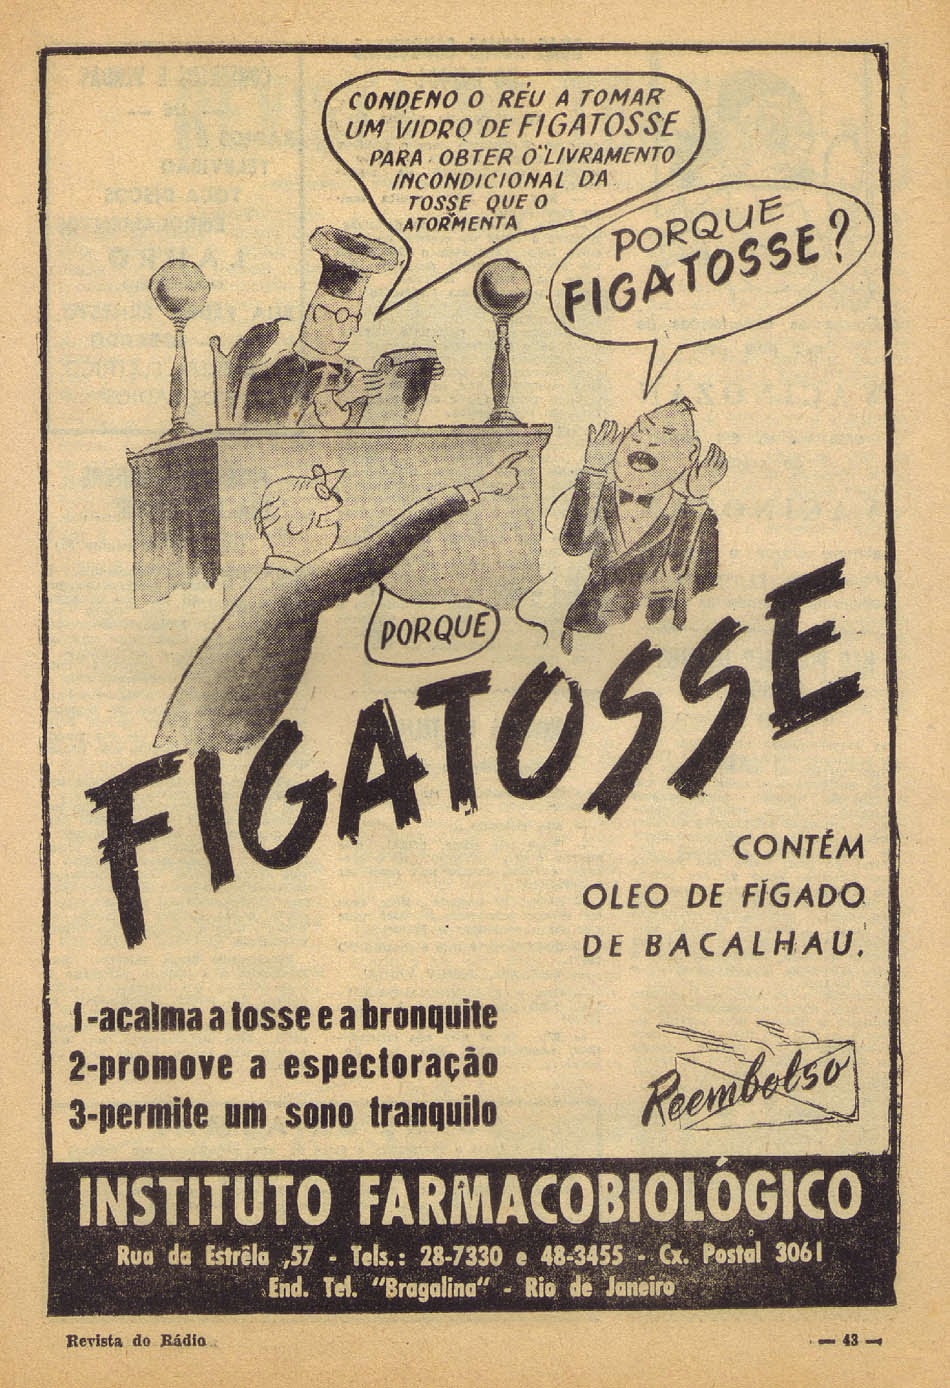 FIGATOSSE